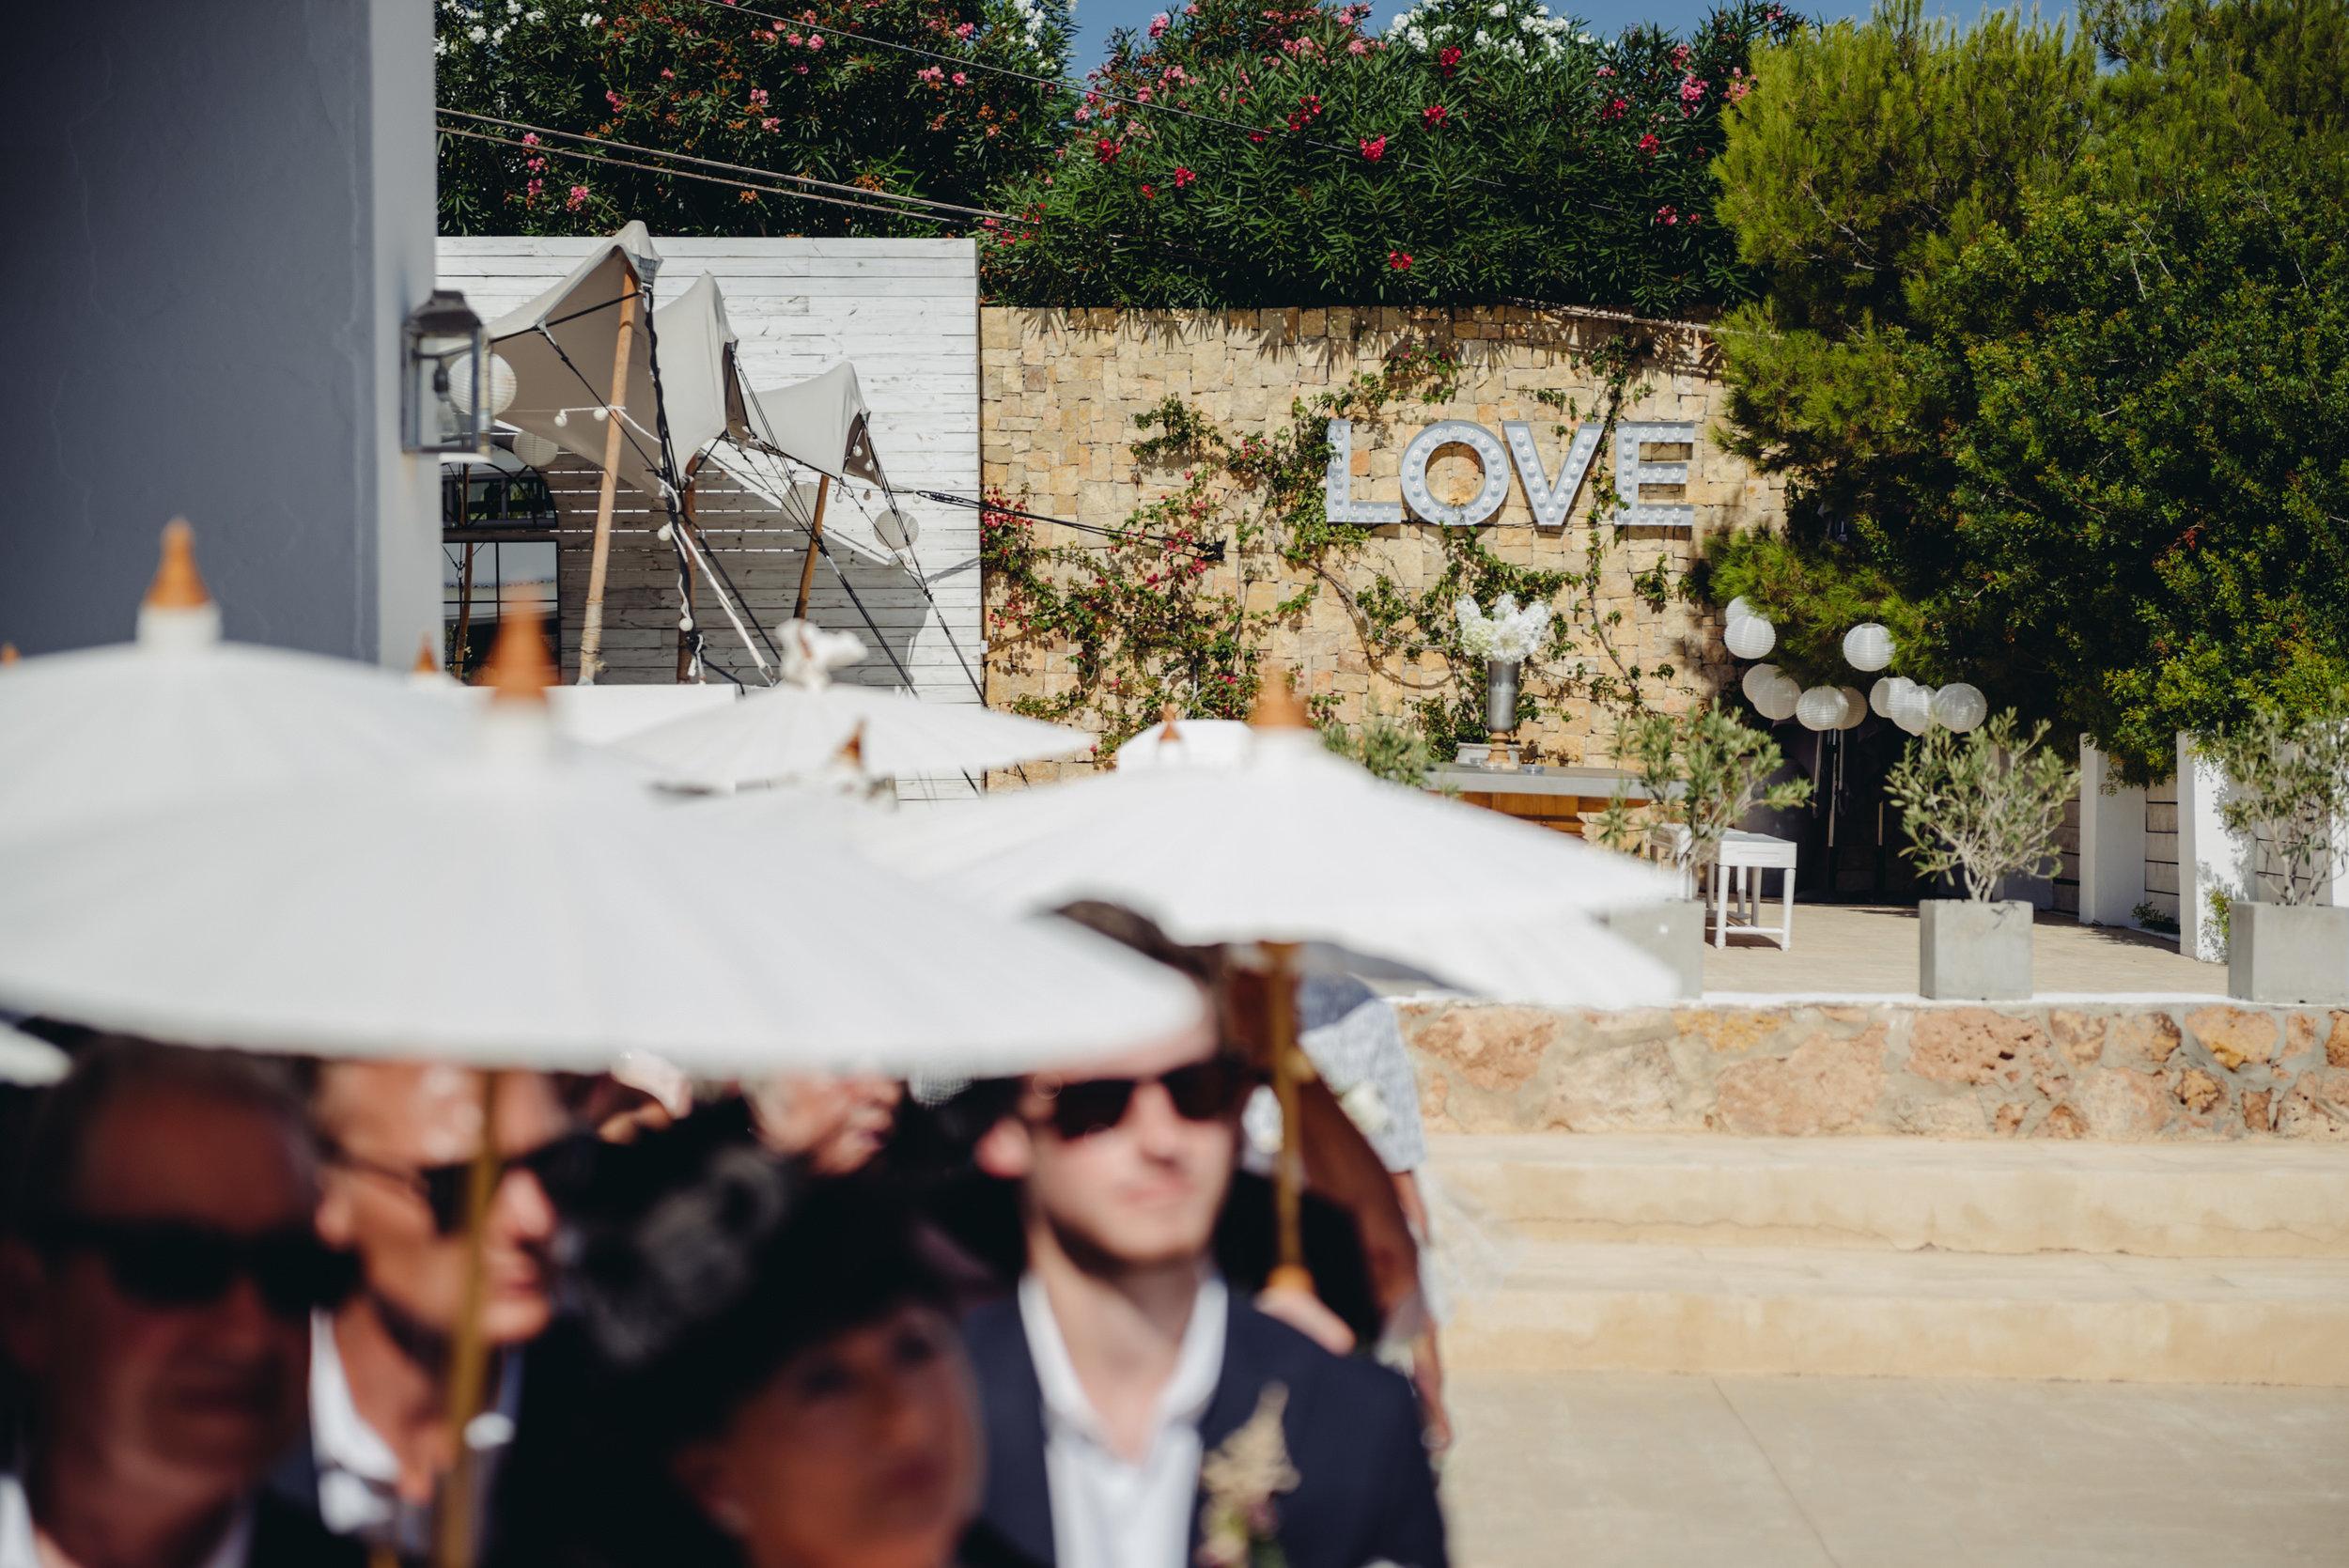 0077-IBIZA-ELIXIR-BEACH-CLUB-WEDDING-PHOTOGRAPHY-ALTERNATIVE-WEDDING-PHOTOGRAPHY.JPG